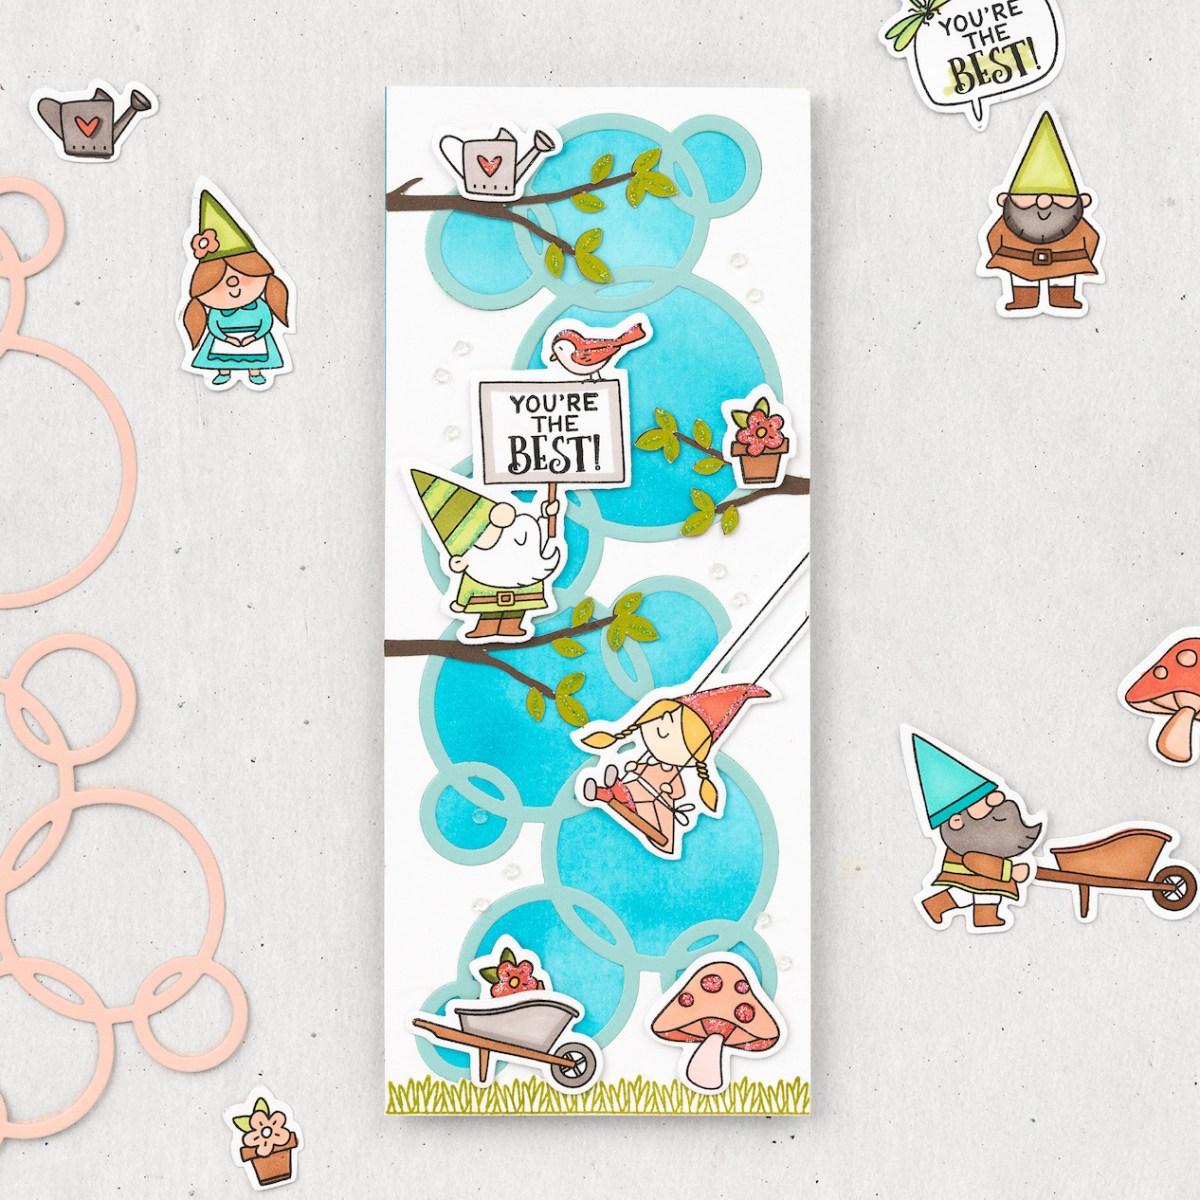 Slimline Cards #closetomyheart #ctmh #nationalstampingmonth #slimlinecelebration #slimlinecards #slimline #cardmaking #gardengnomes